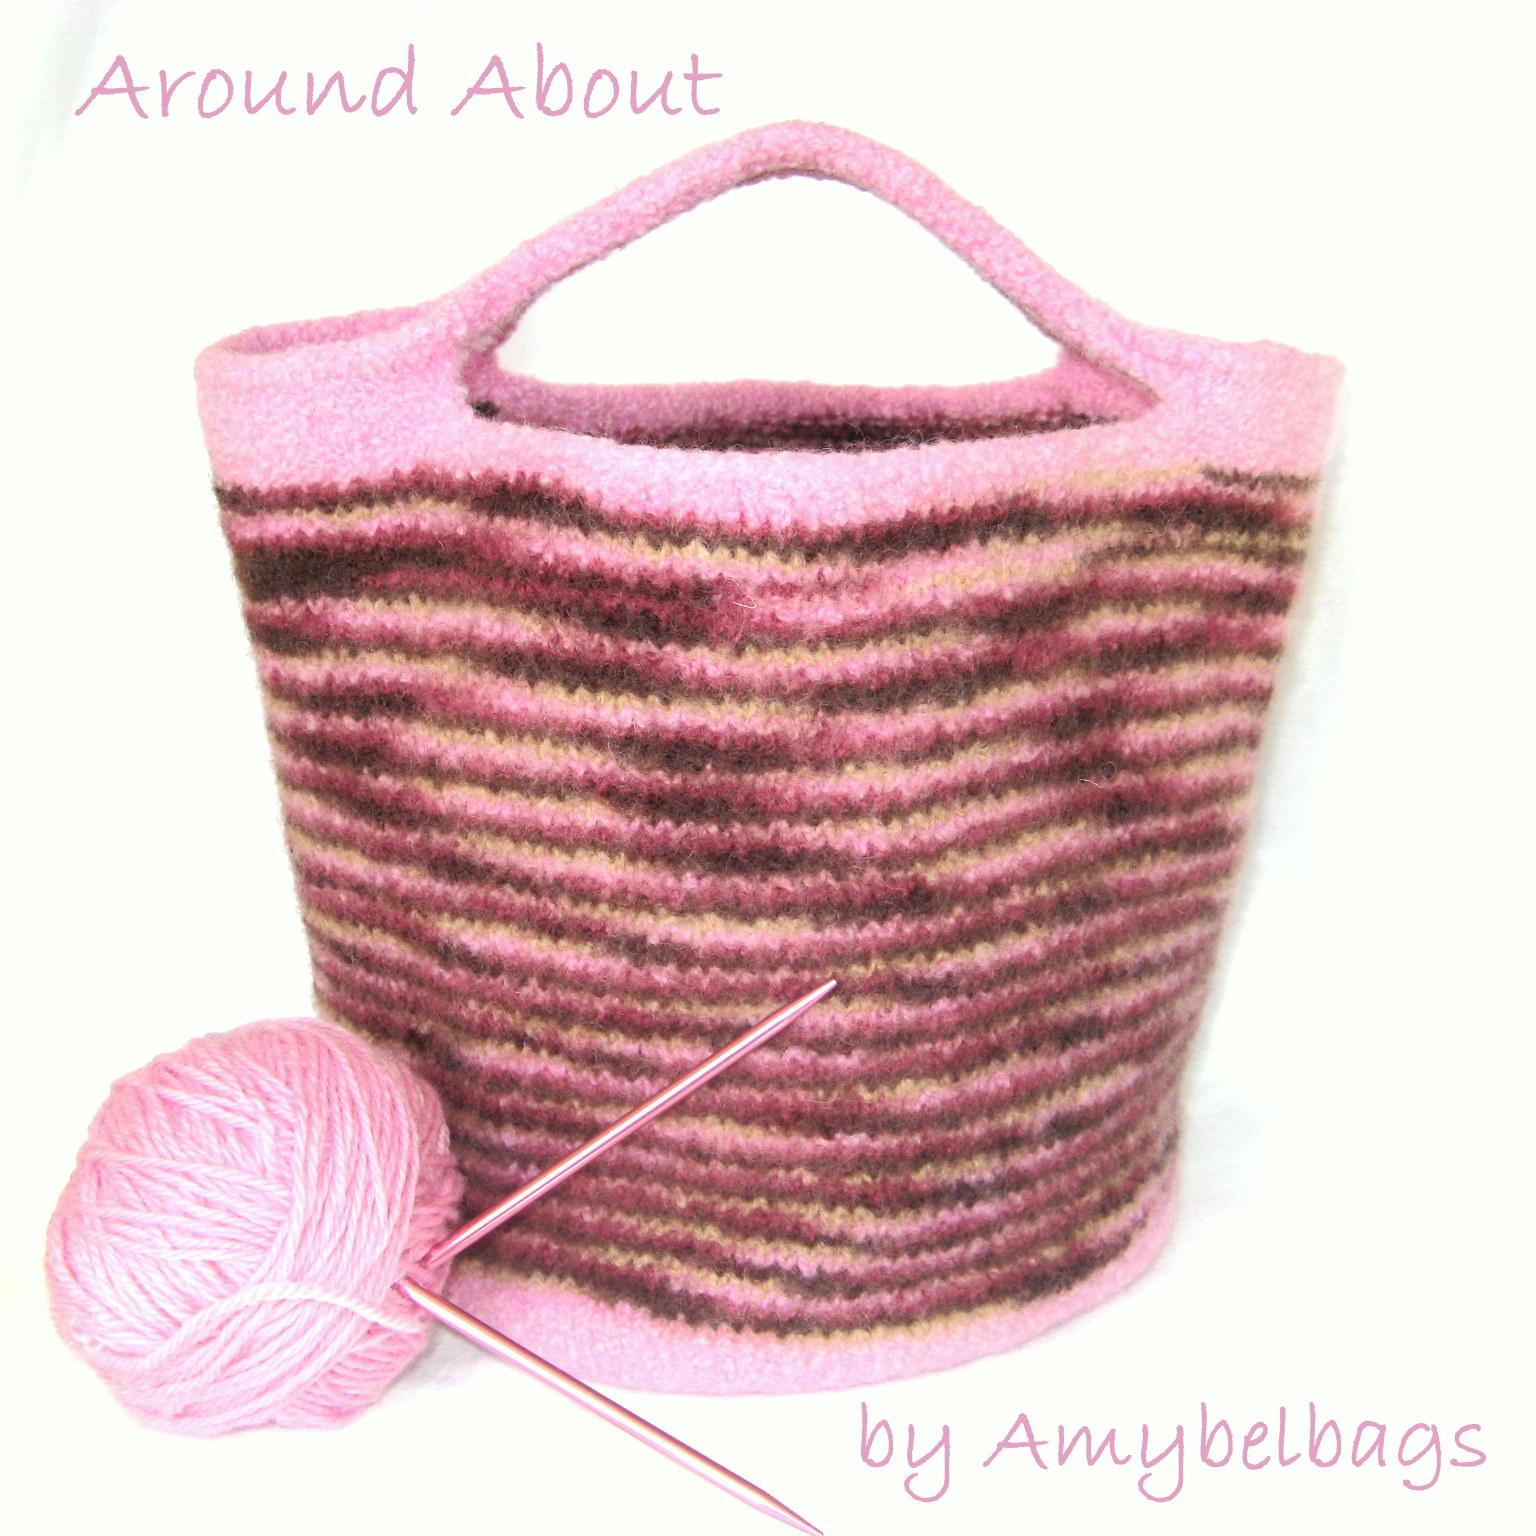 Knitting in my Backyarn: Free Patterns